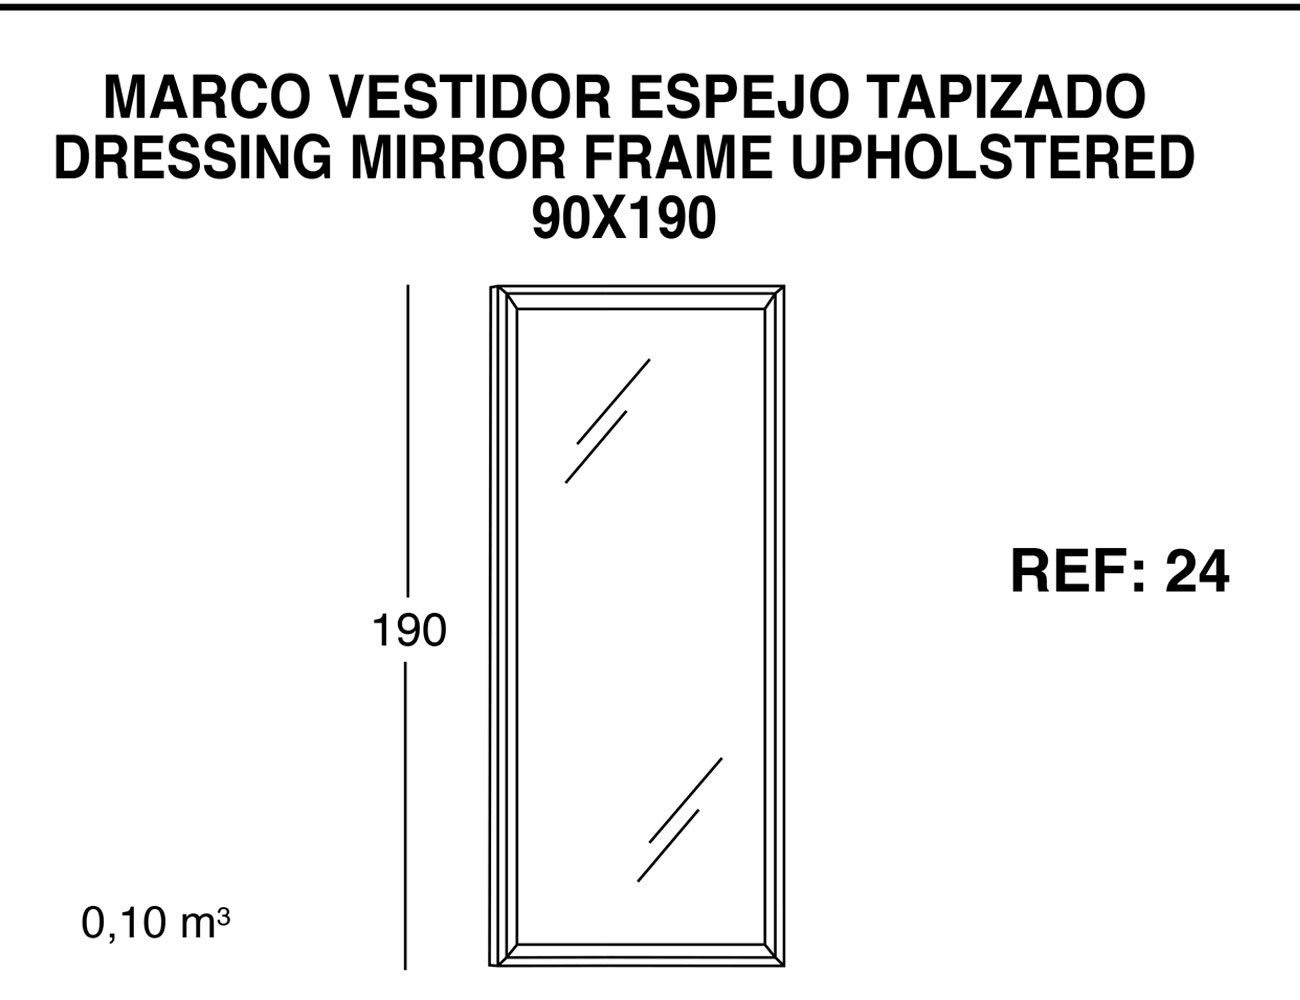 Marco vestidor espejo tapizado